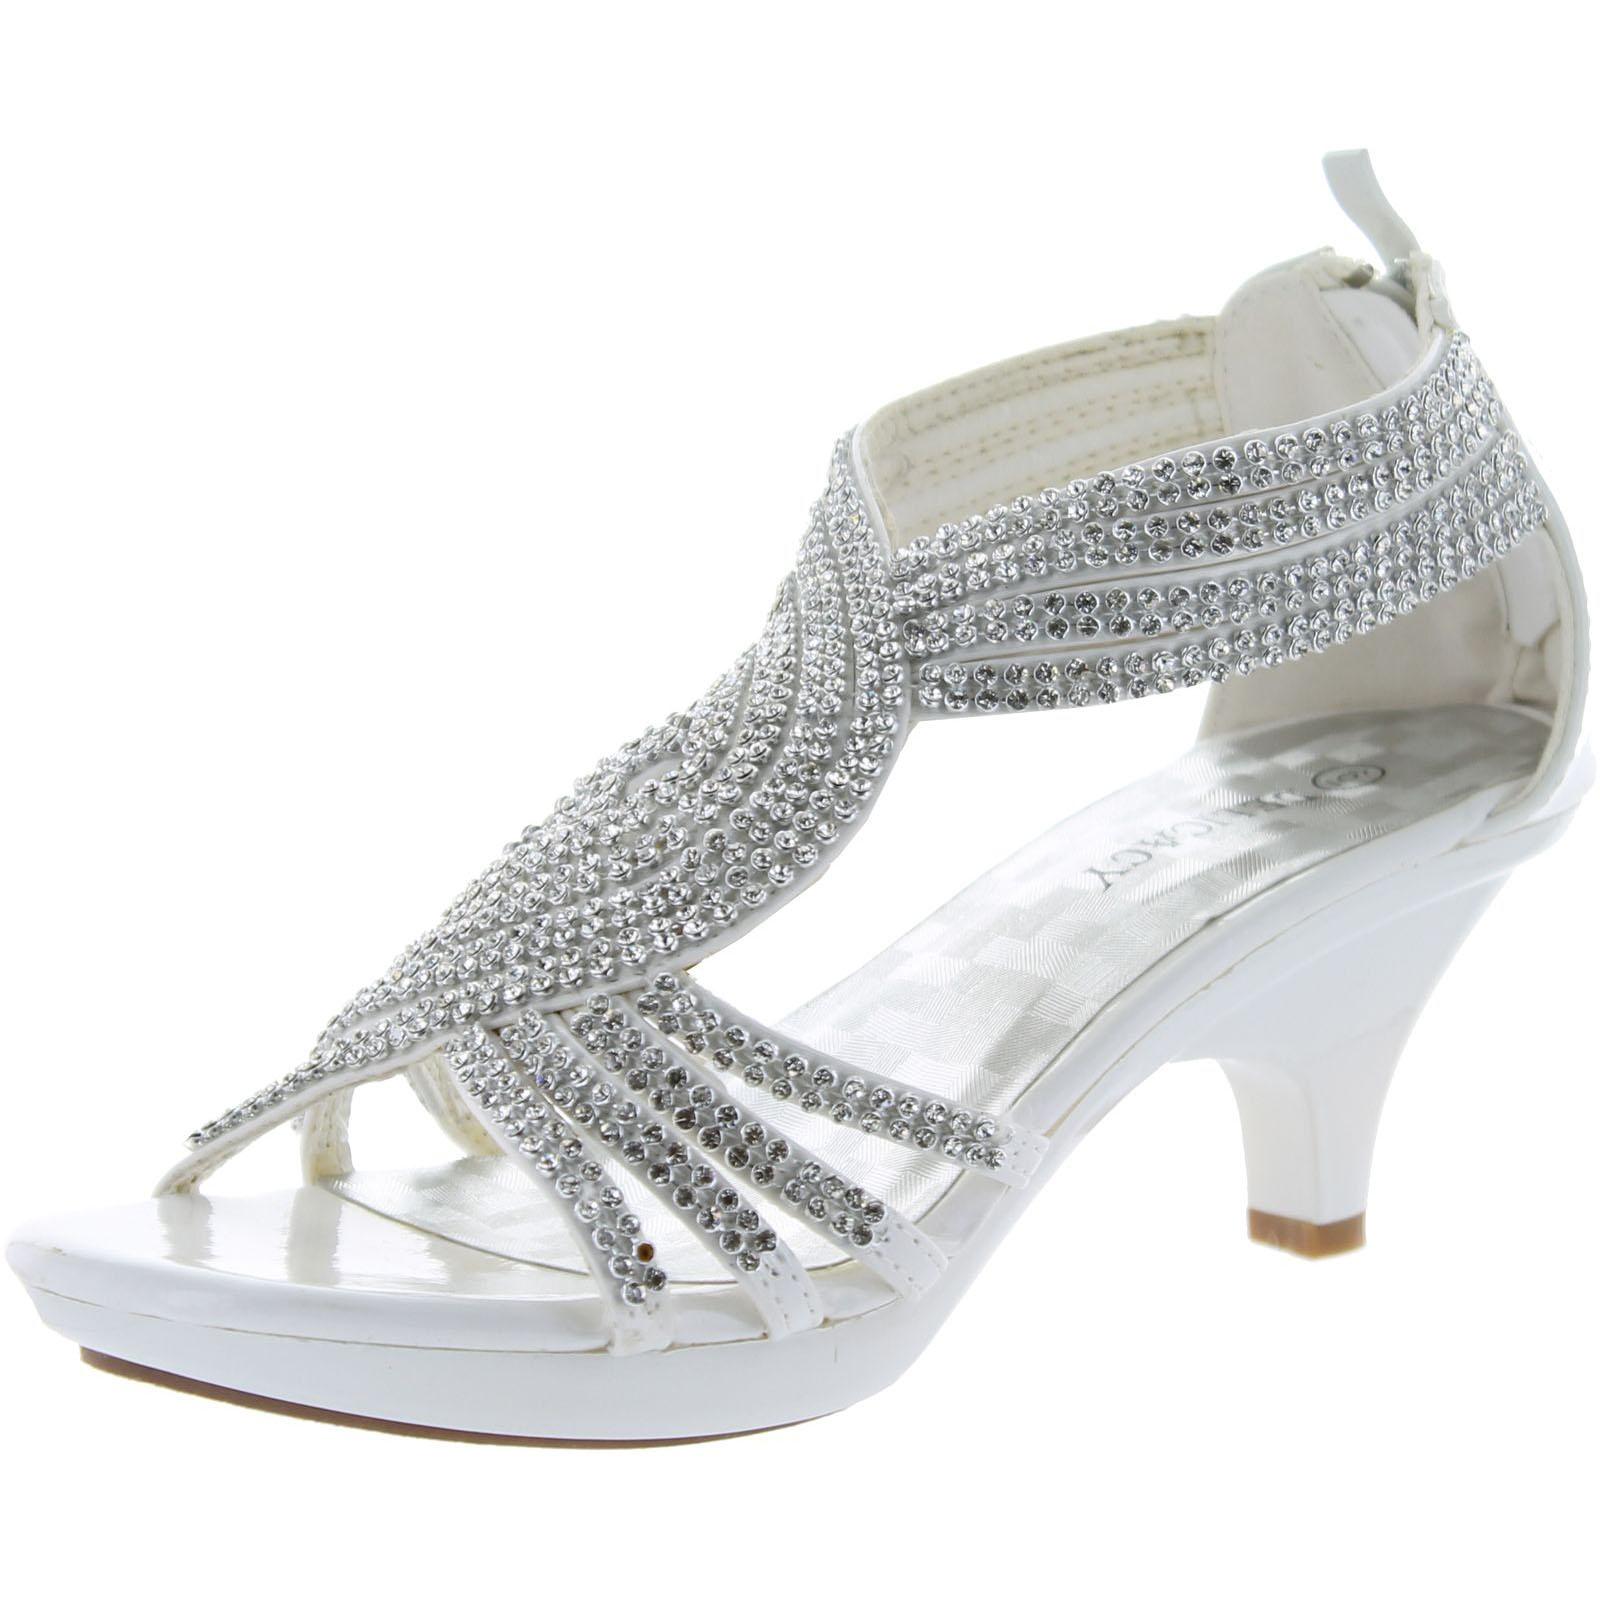 02d791af497 Static Footwear Delicacy Womens Angel-37 Strappy Rhinestone Dress Sandal  Low Heel Shoes